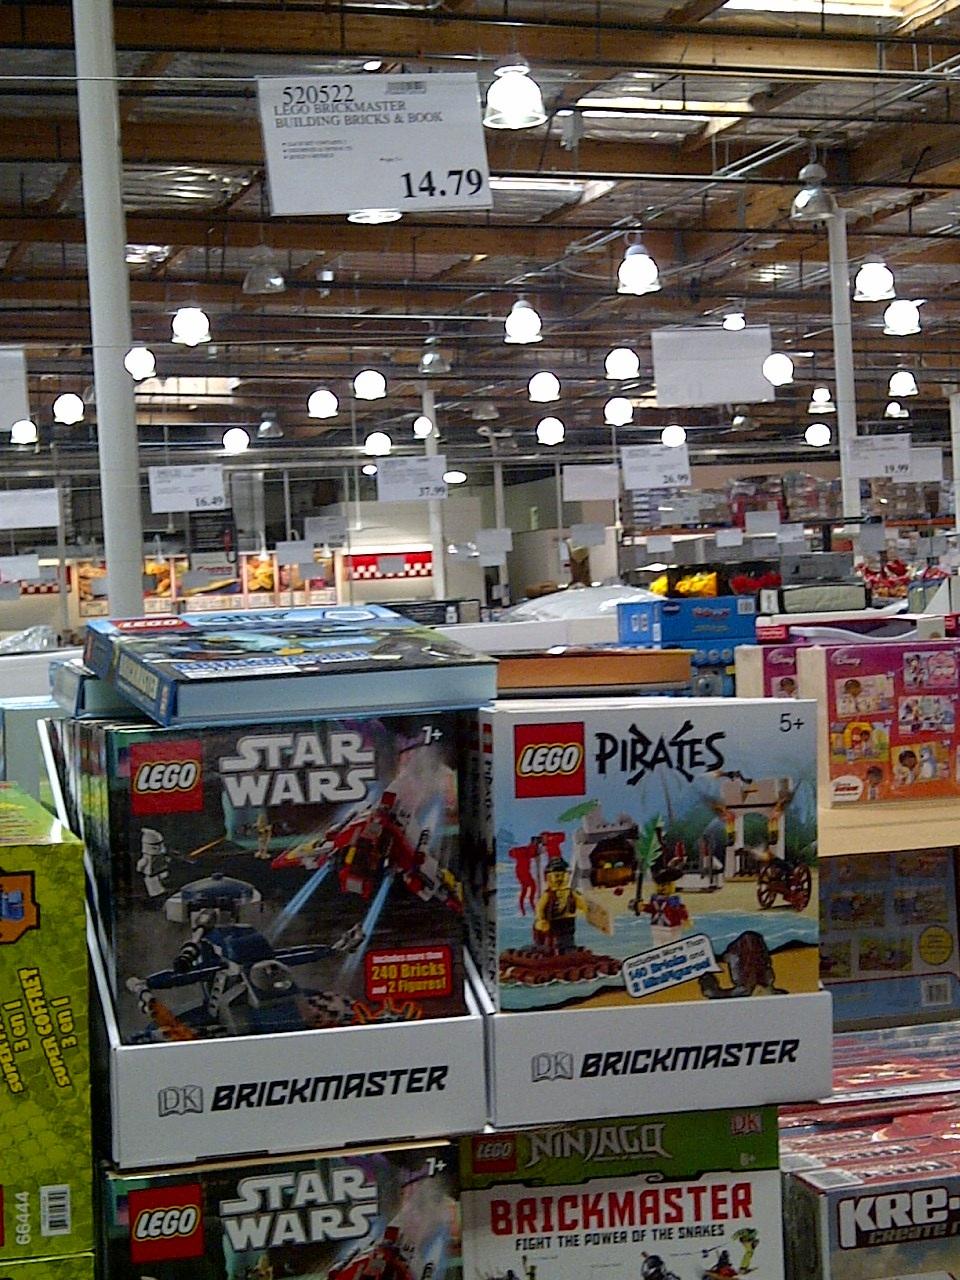 Sale On Legos Toys N Bricks Lego News Site Sales Deals Reviews Mocs Blog